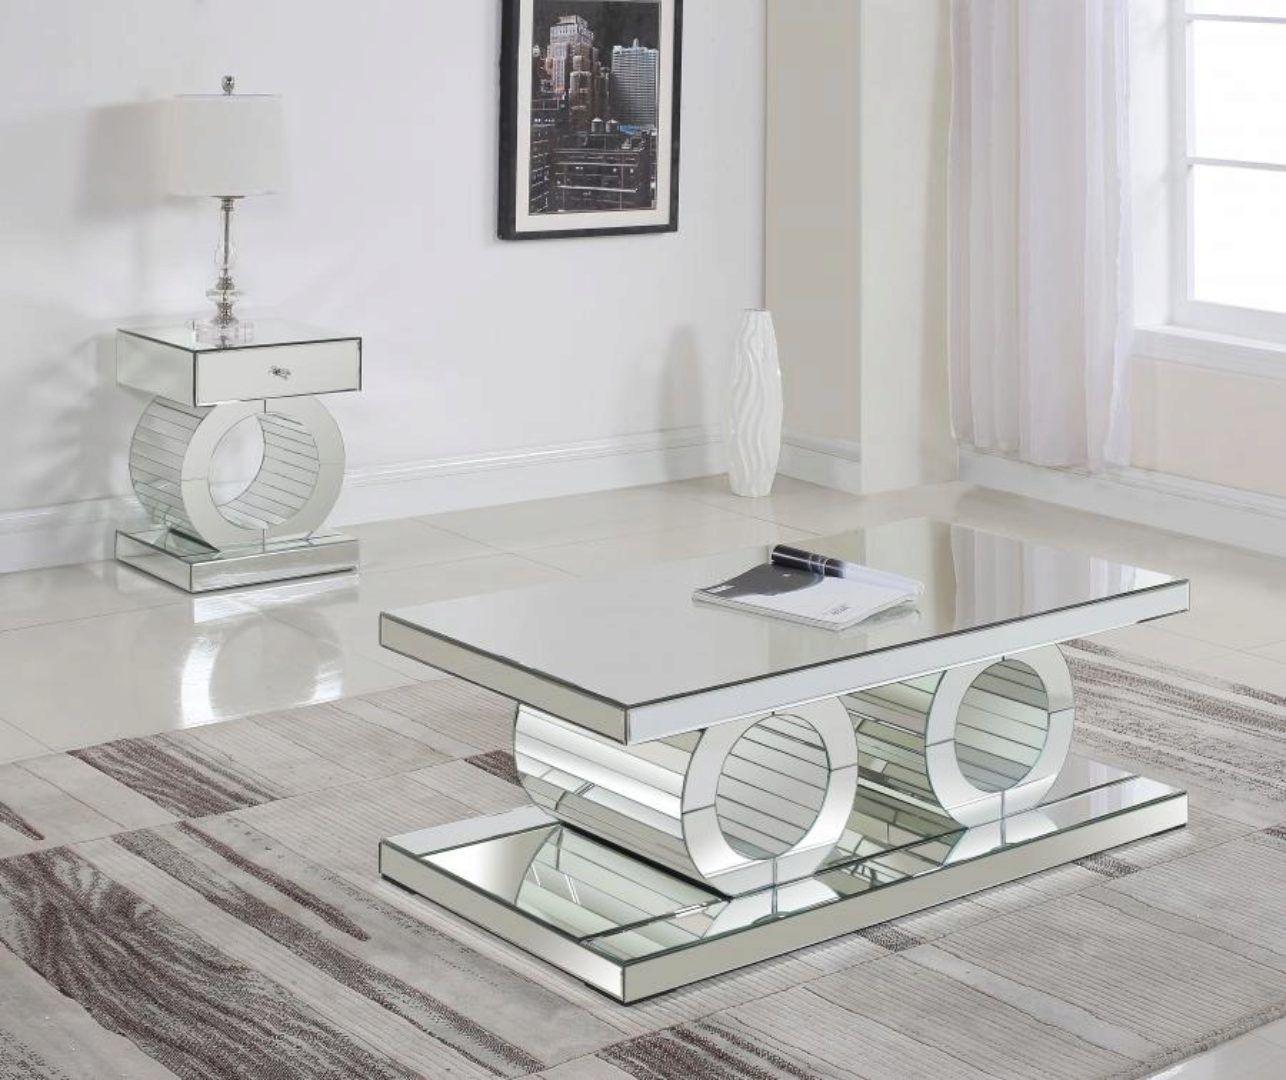 Modern Crystal Acrylic Coffee End Table Set 2pcs Meridian Furniture Jocelyn 227 Set 2 Mirrored Furniture Decor Coffee Table Meridian Furniture [ 1080 x 1286 Pixel ]